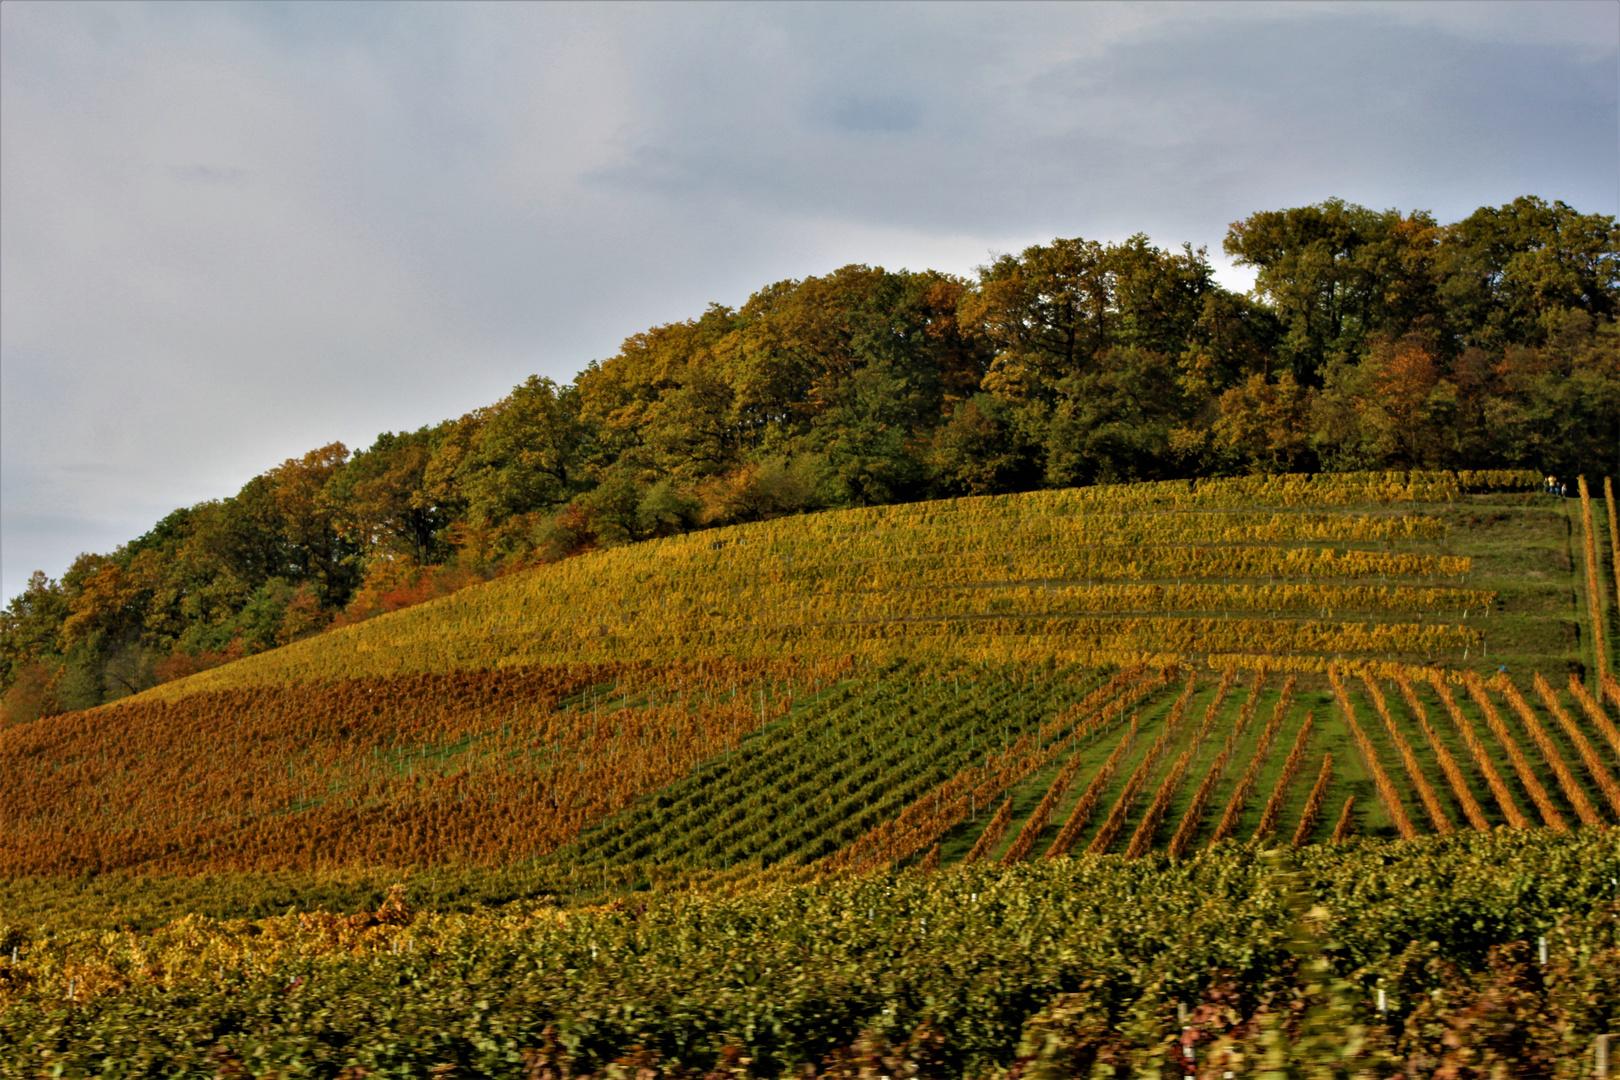 Herbstliche Weinberge nahe Heilbronn